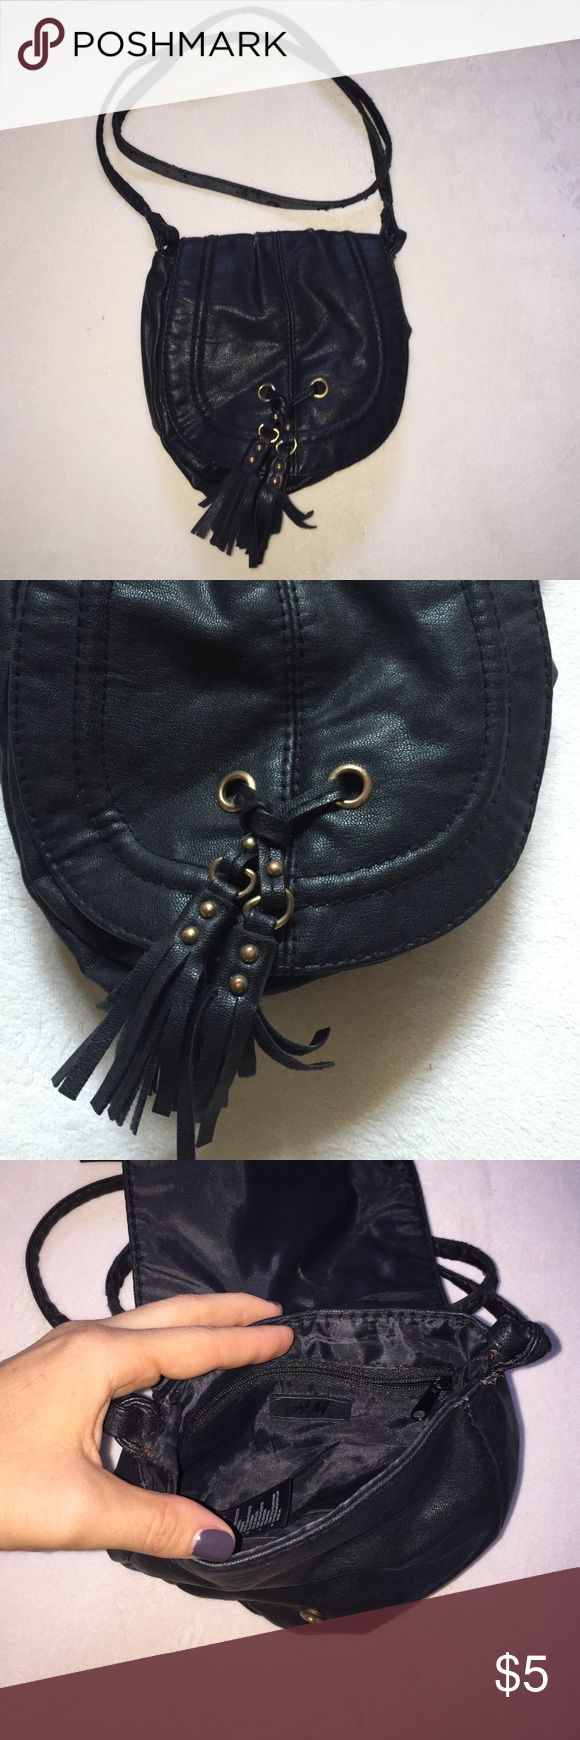 H&M purse Small boho black shoulder purse, wear and tear on the shoulder strap. H&M Bags Mini Bags